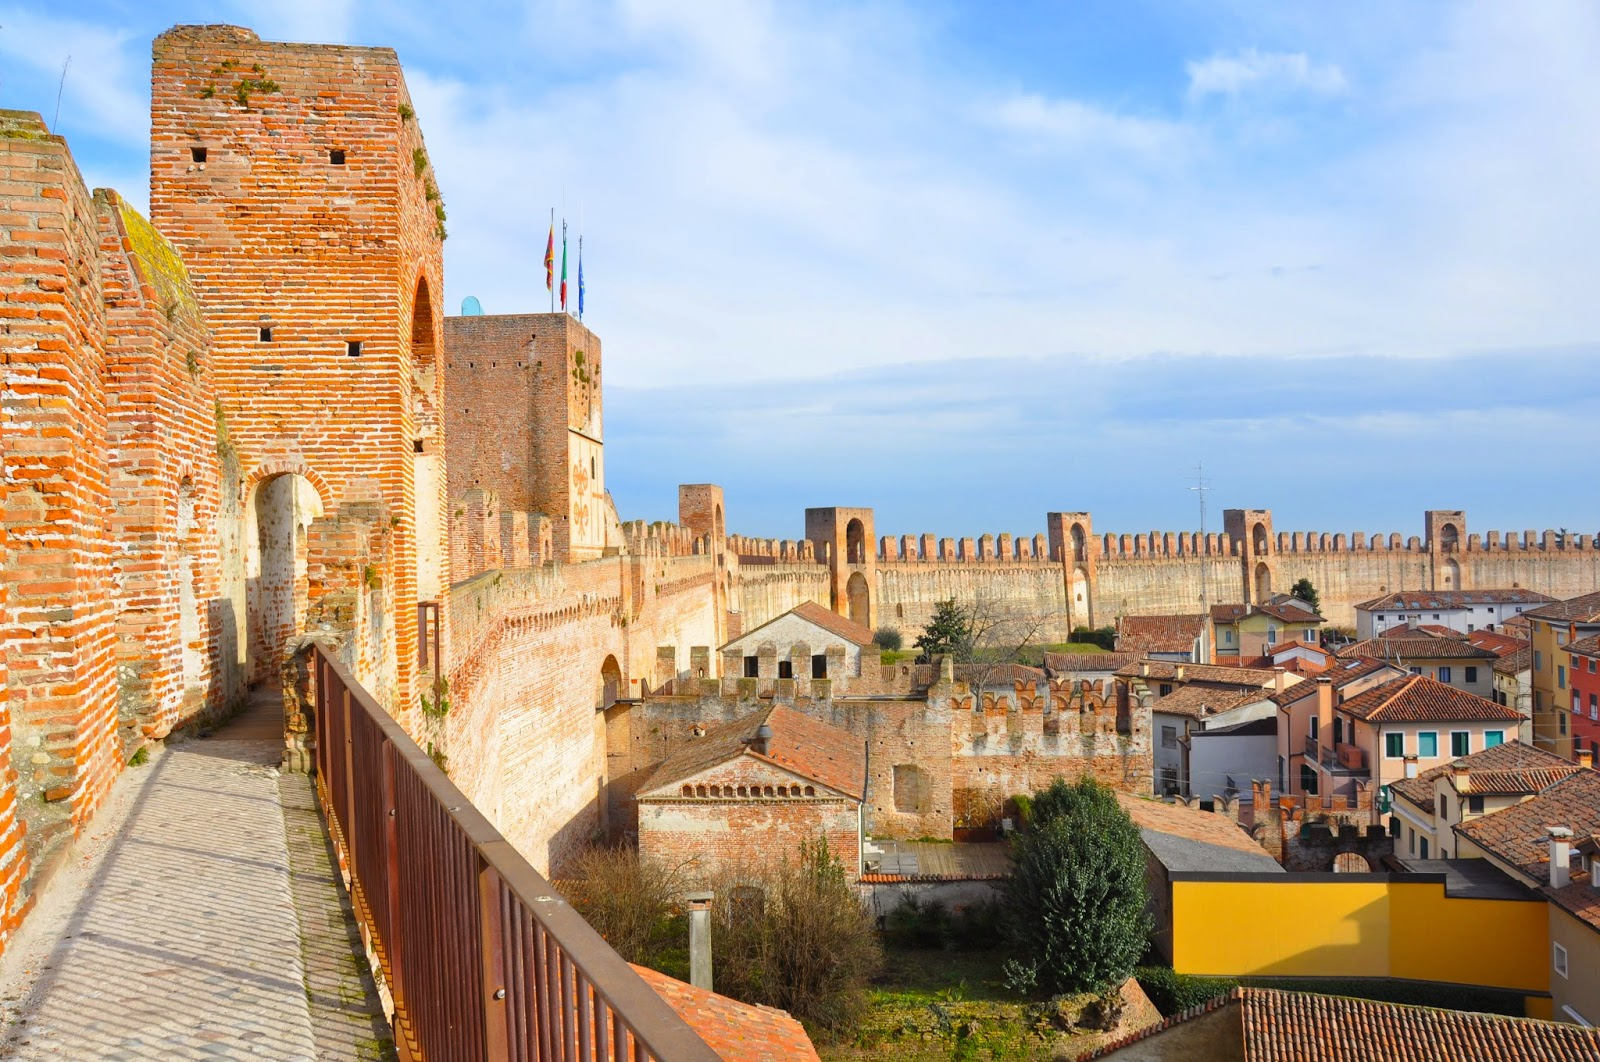 medieval wall parapet walkway cittadella veneto